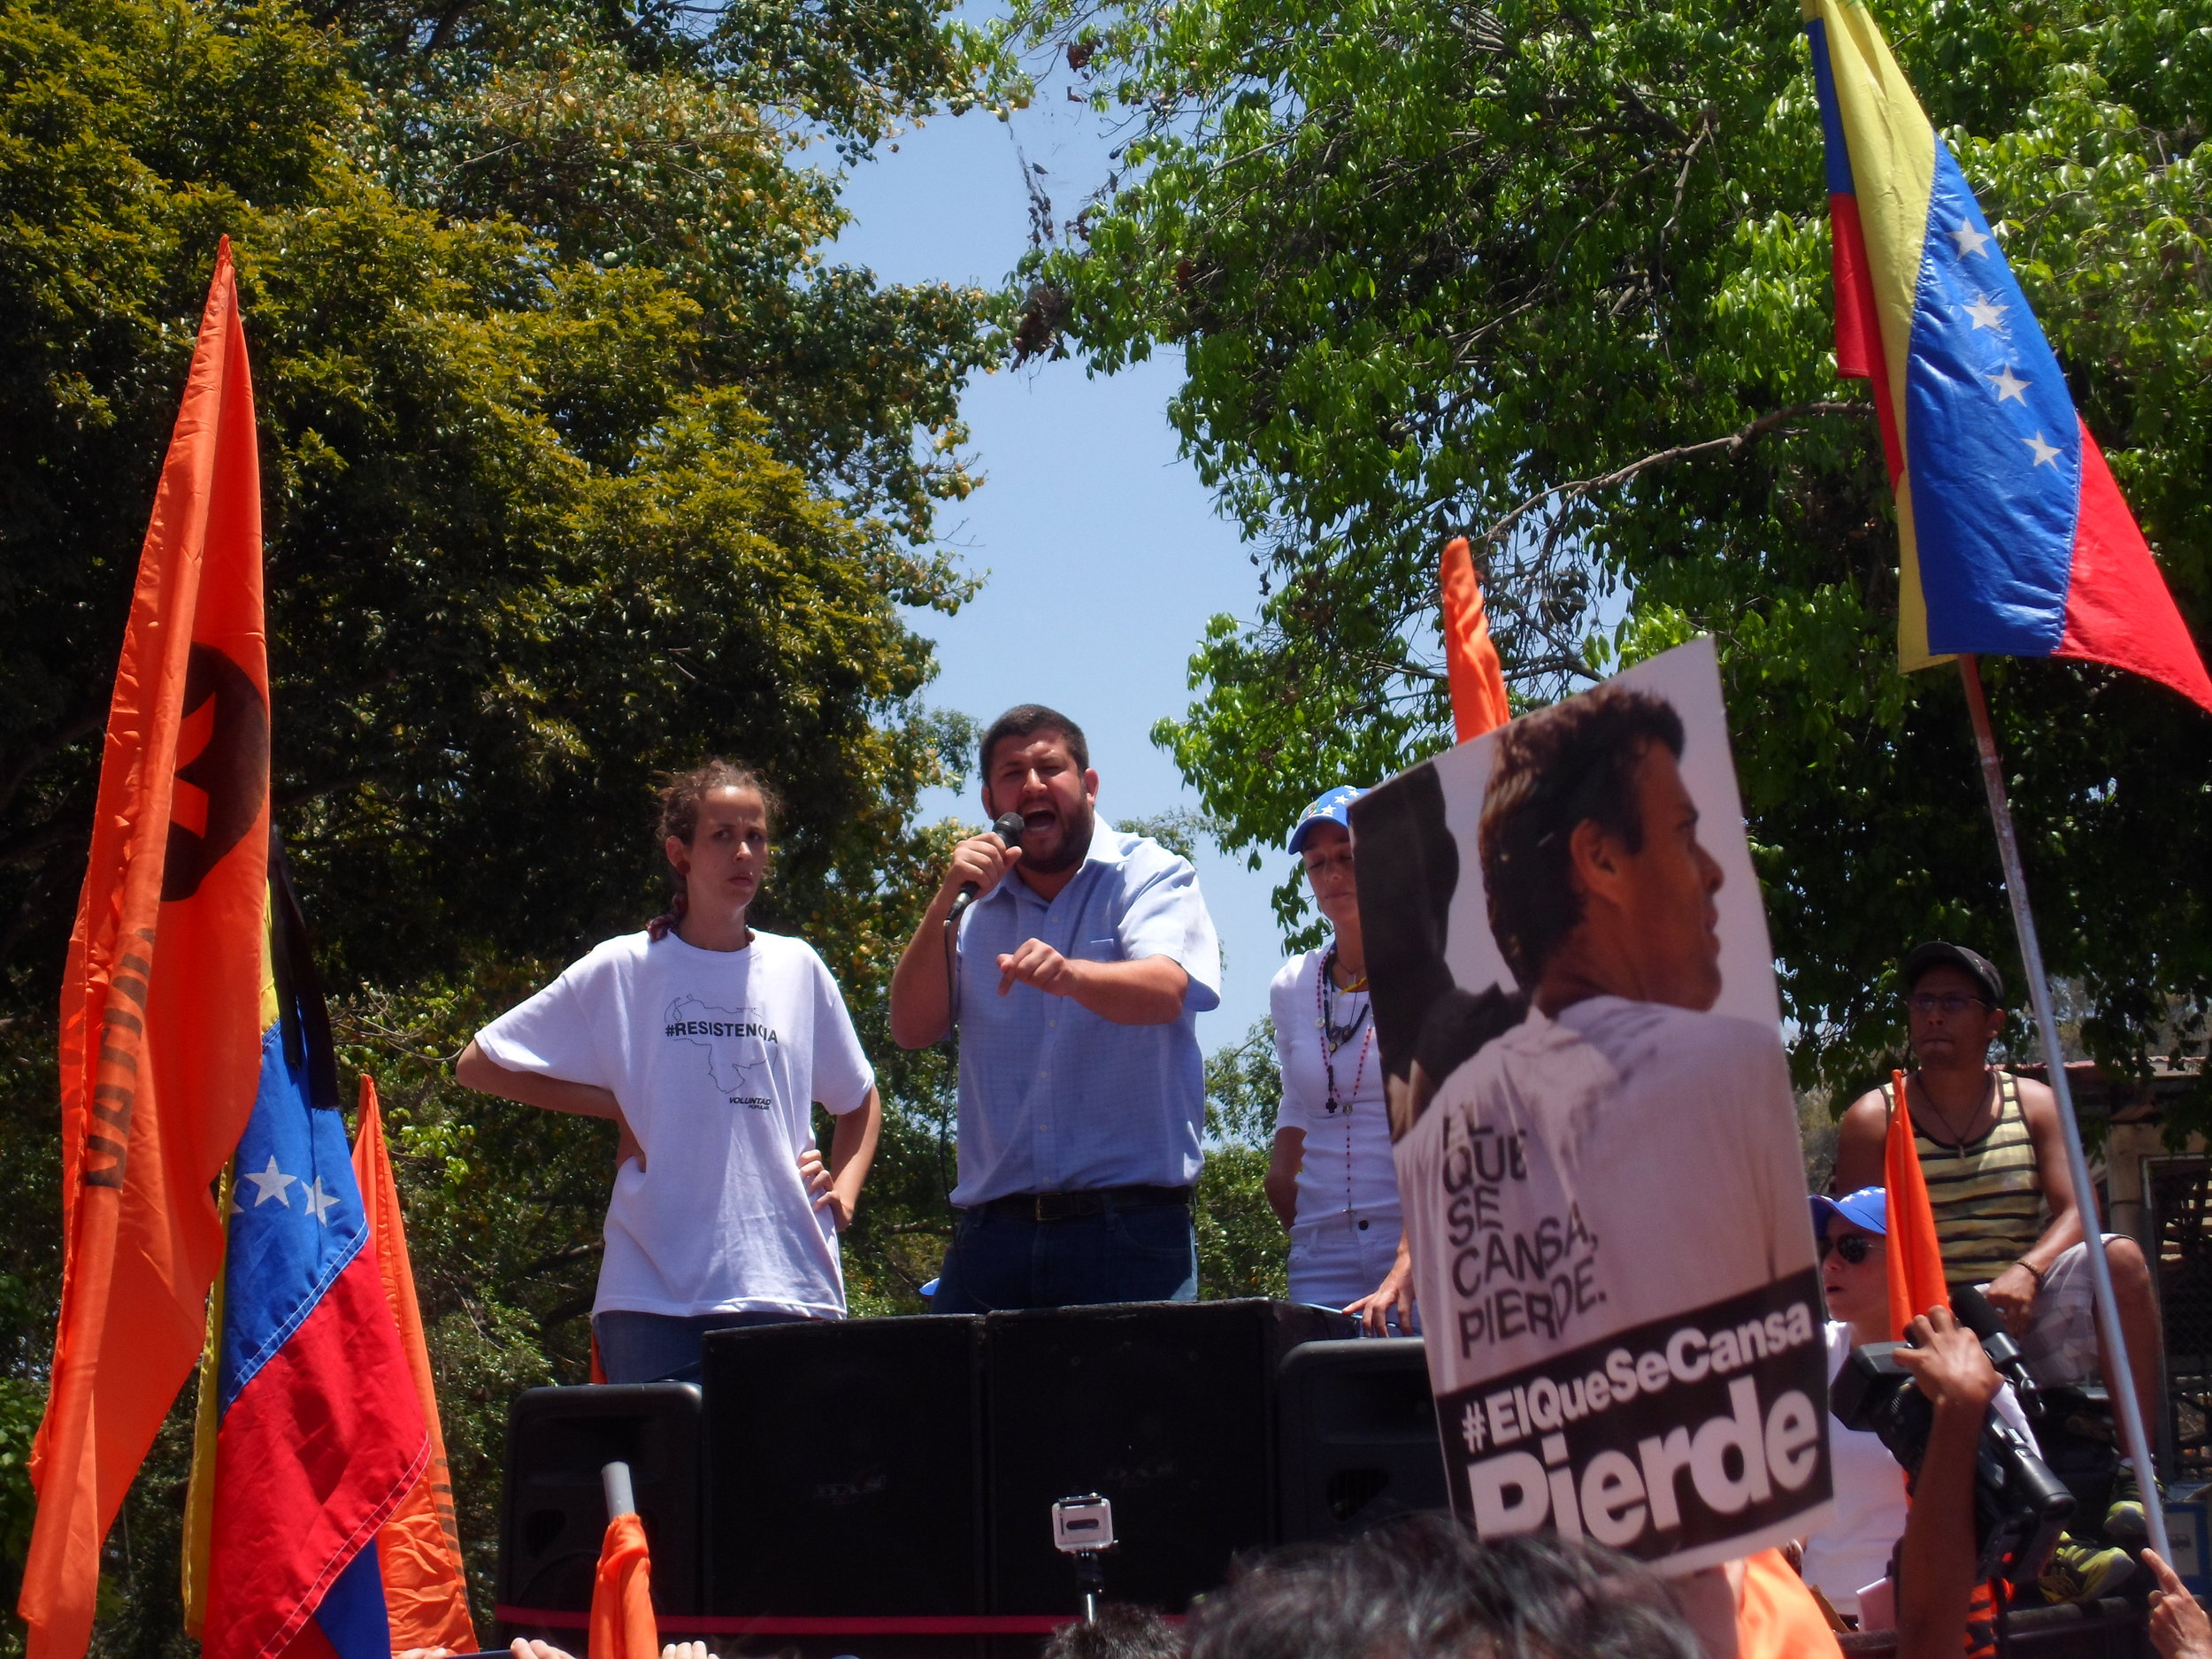 David Smolansky speaks at an opposition rally in Venezuela in 2014. (Wikimedia Commons)